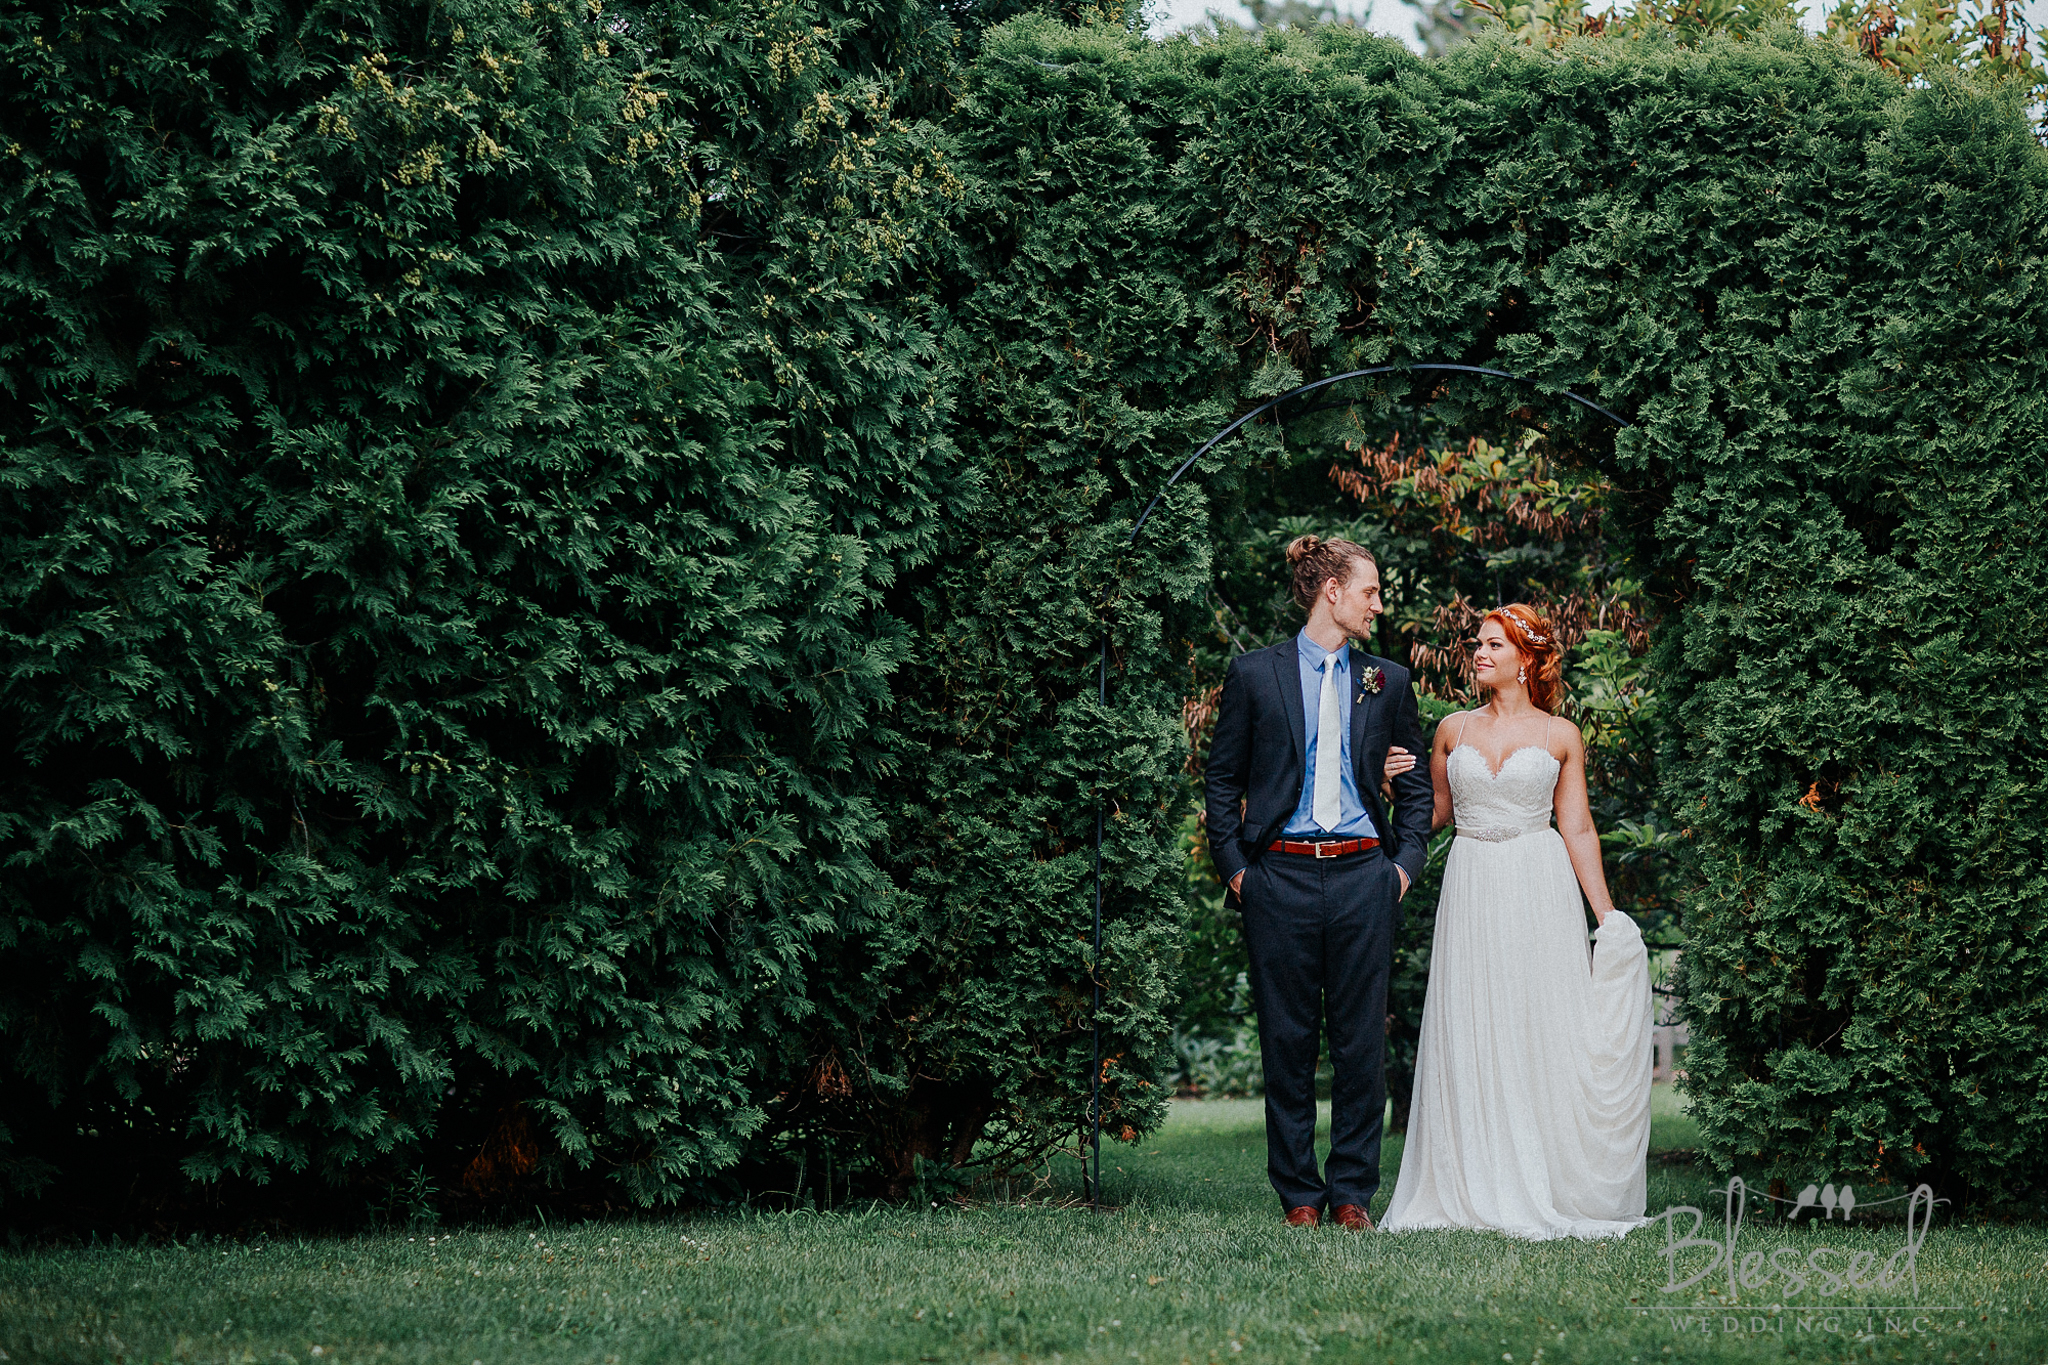 Destination Wedding Photography Minnesota By Blessed Wedding Photographers-49.jpg